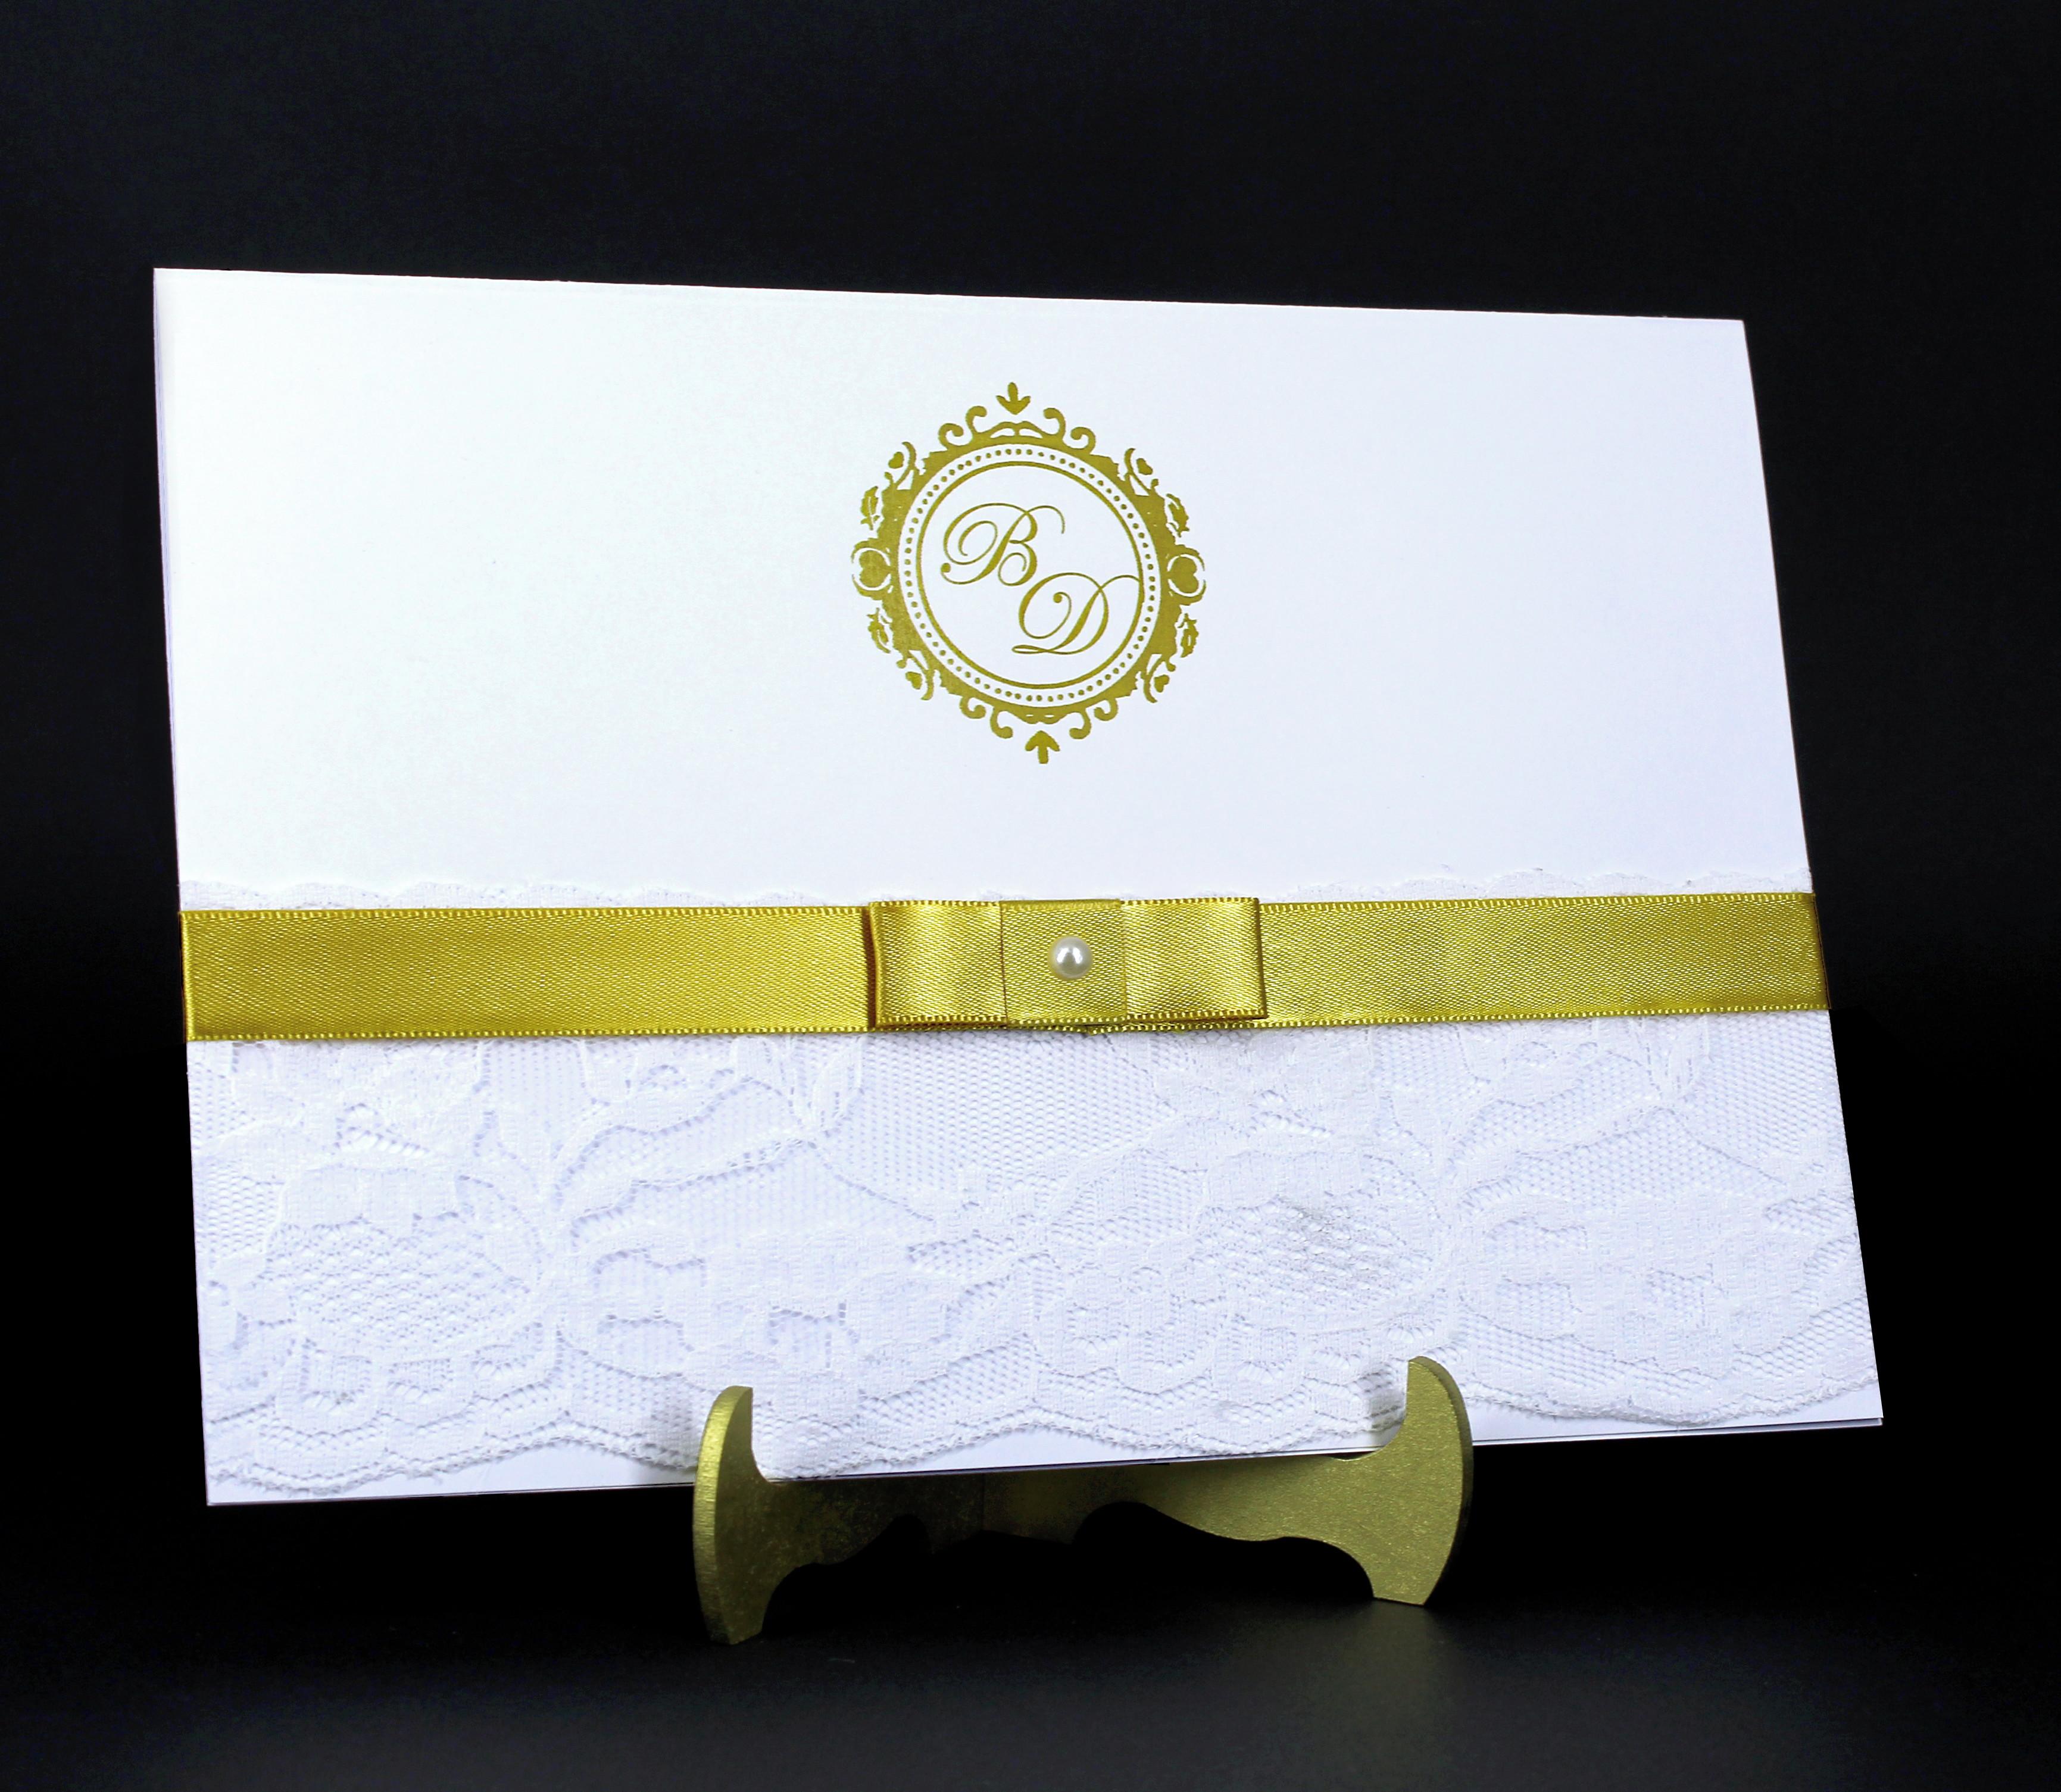 575ae8708 Convite Casamento Adriana | Elo7